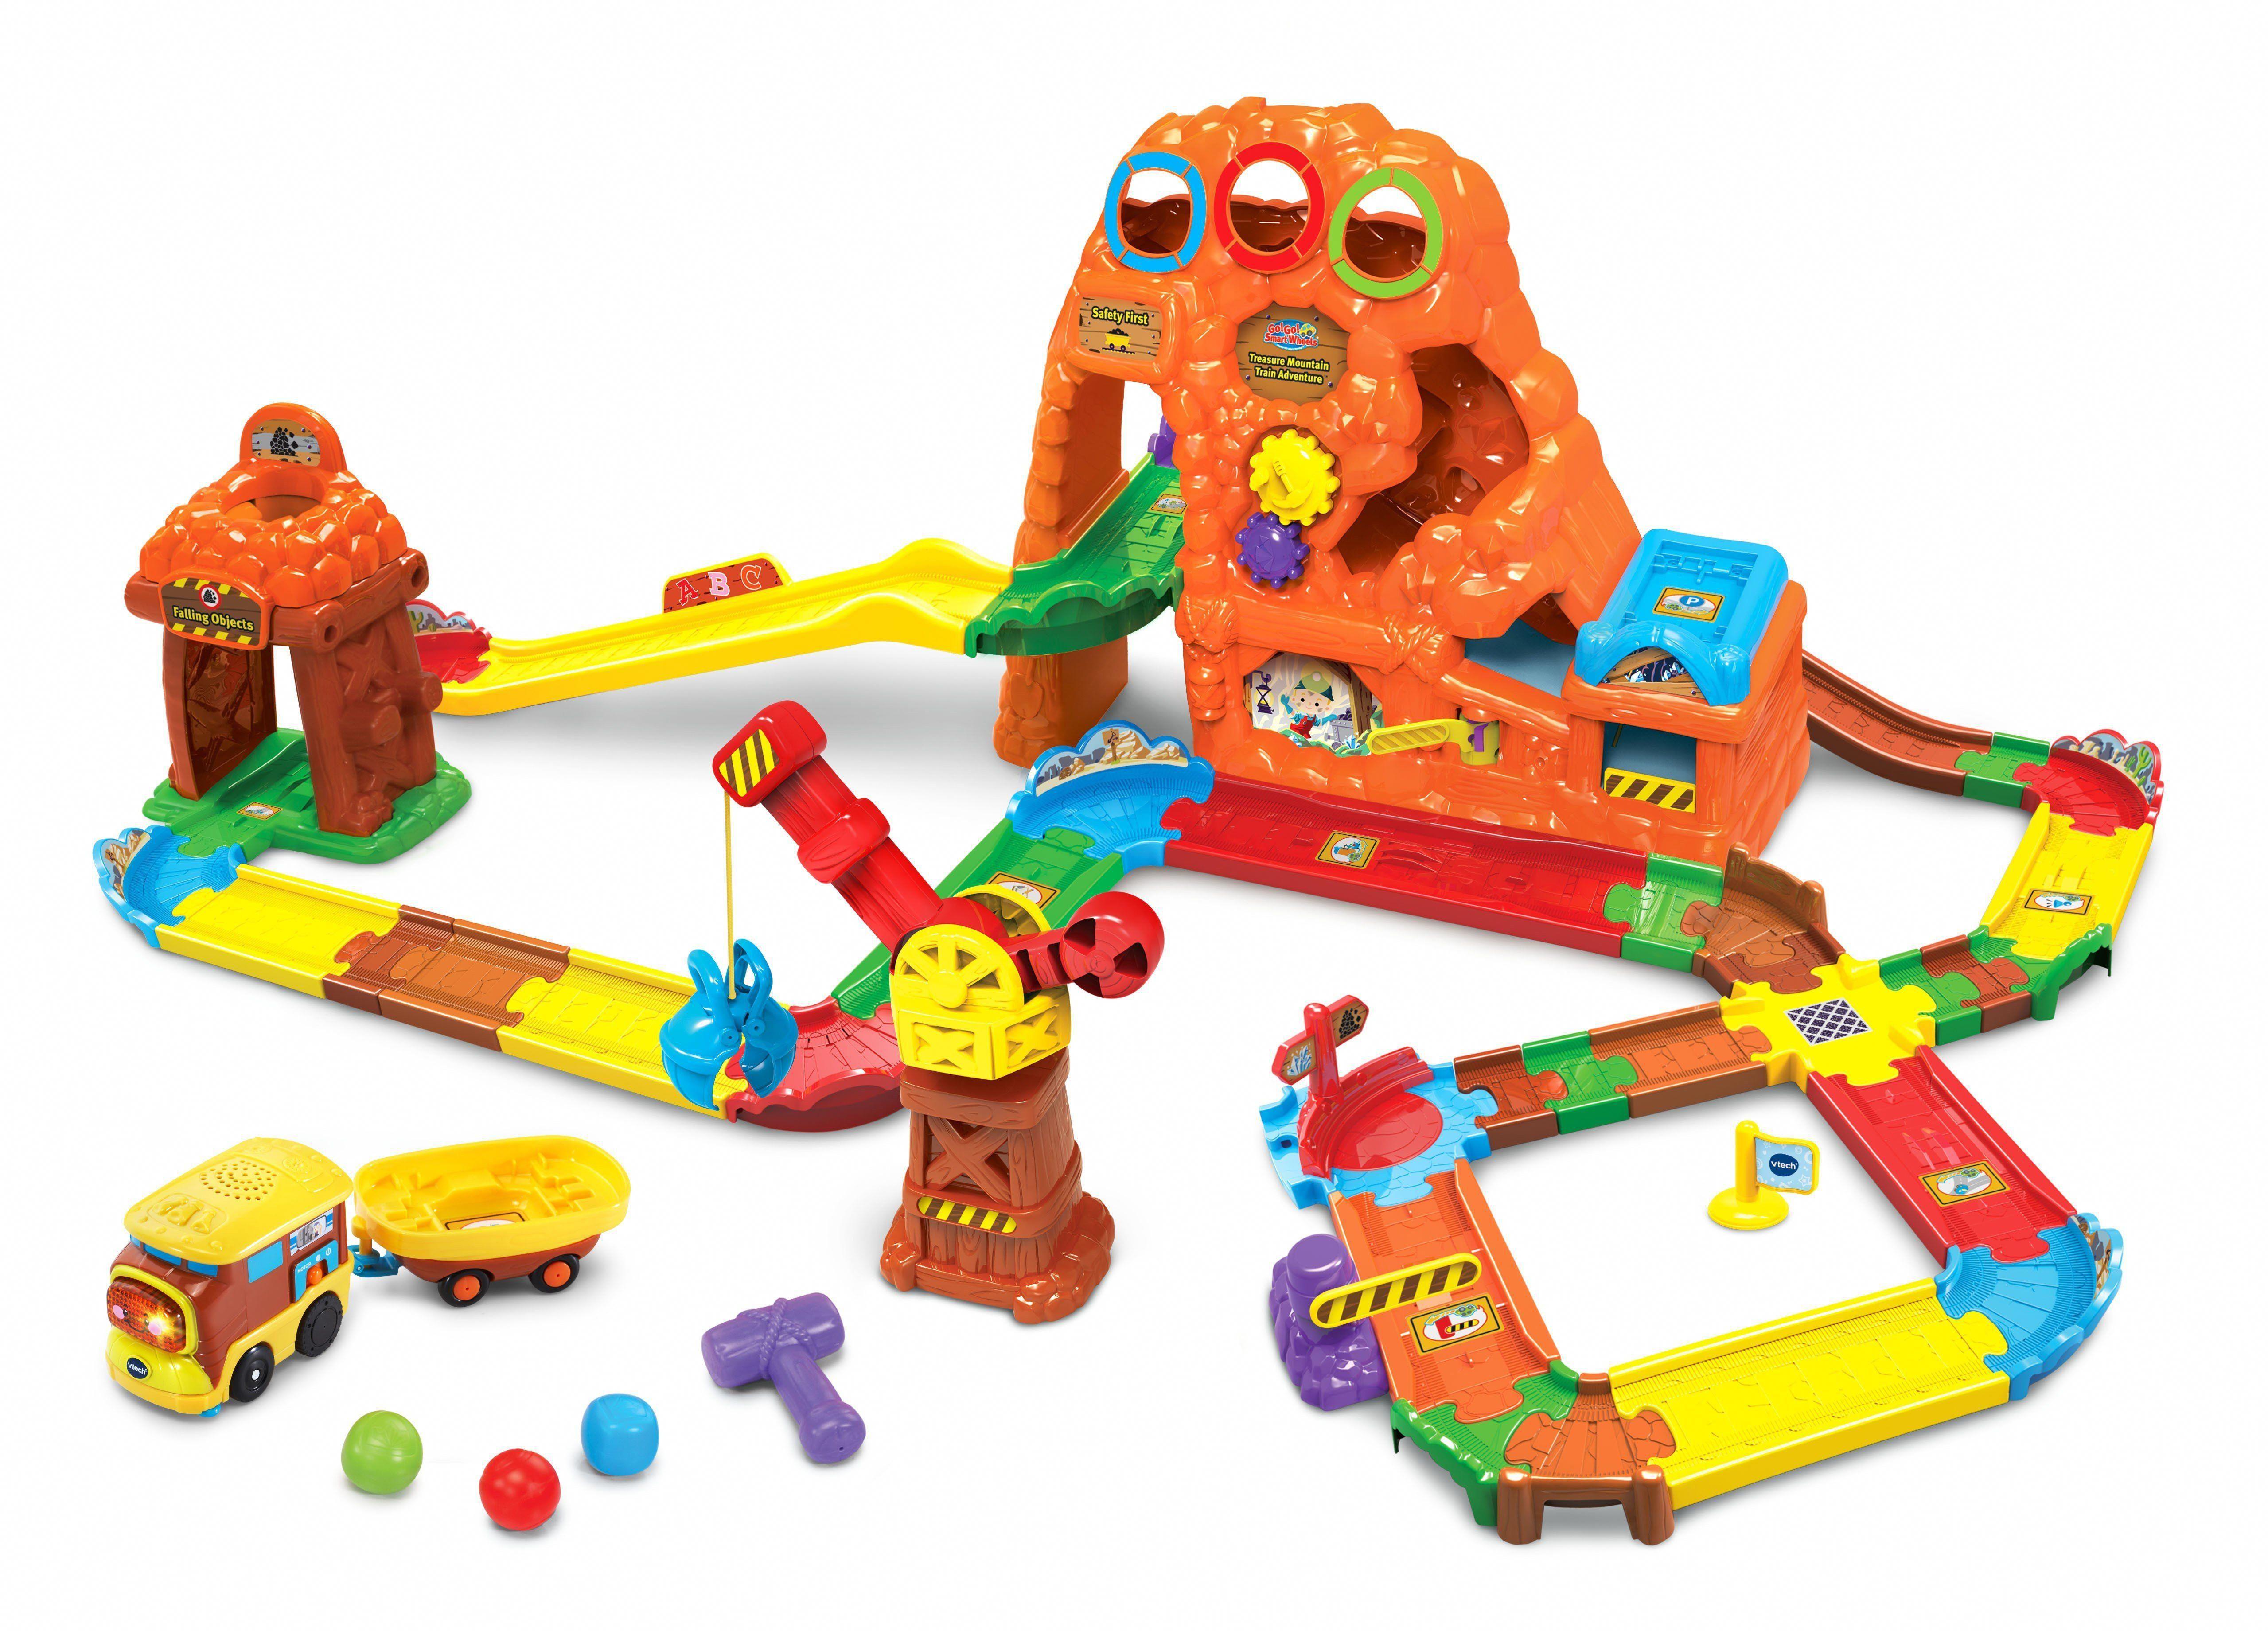 Fashion Dresses For Toddlers Kidsfashionchristmas Id 7123033814 Boybandfashion Train Adventure Playset Cool Toys